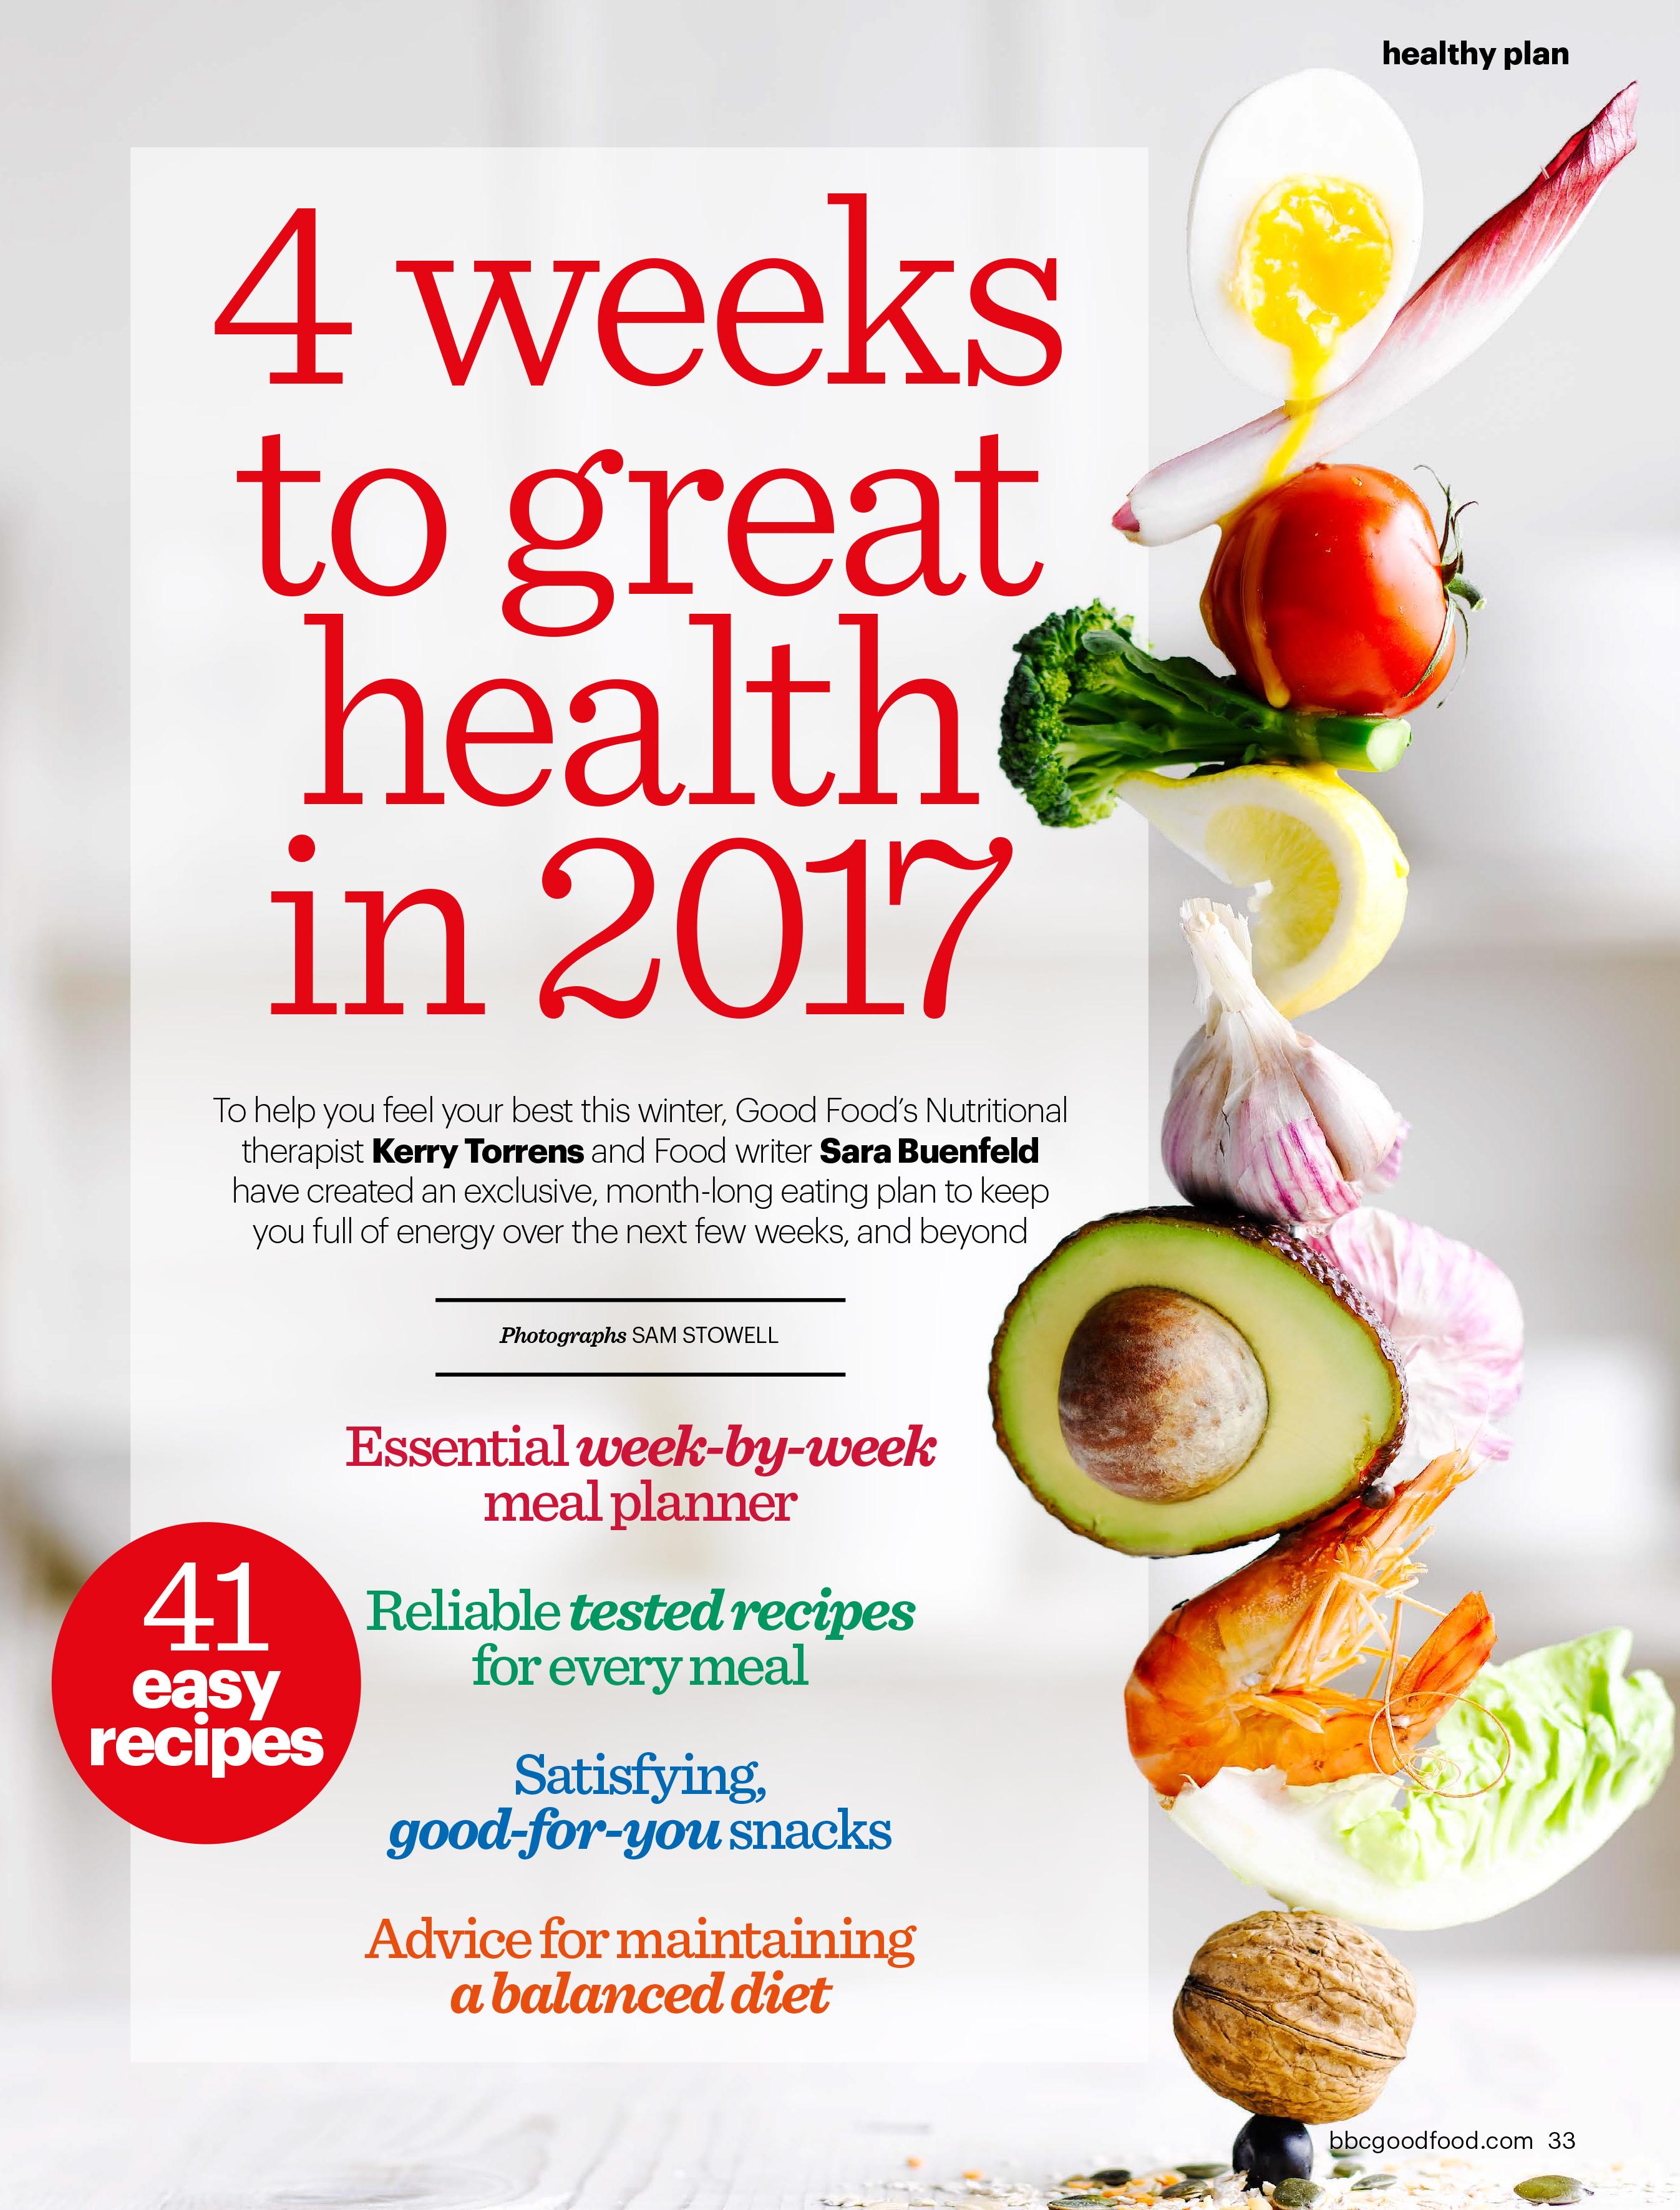 BBC GOOD FOOD HCS HEALTHY ©Immediate